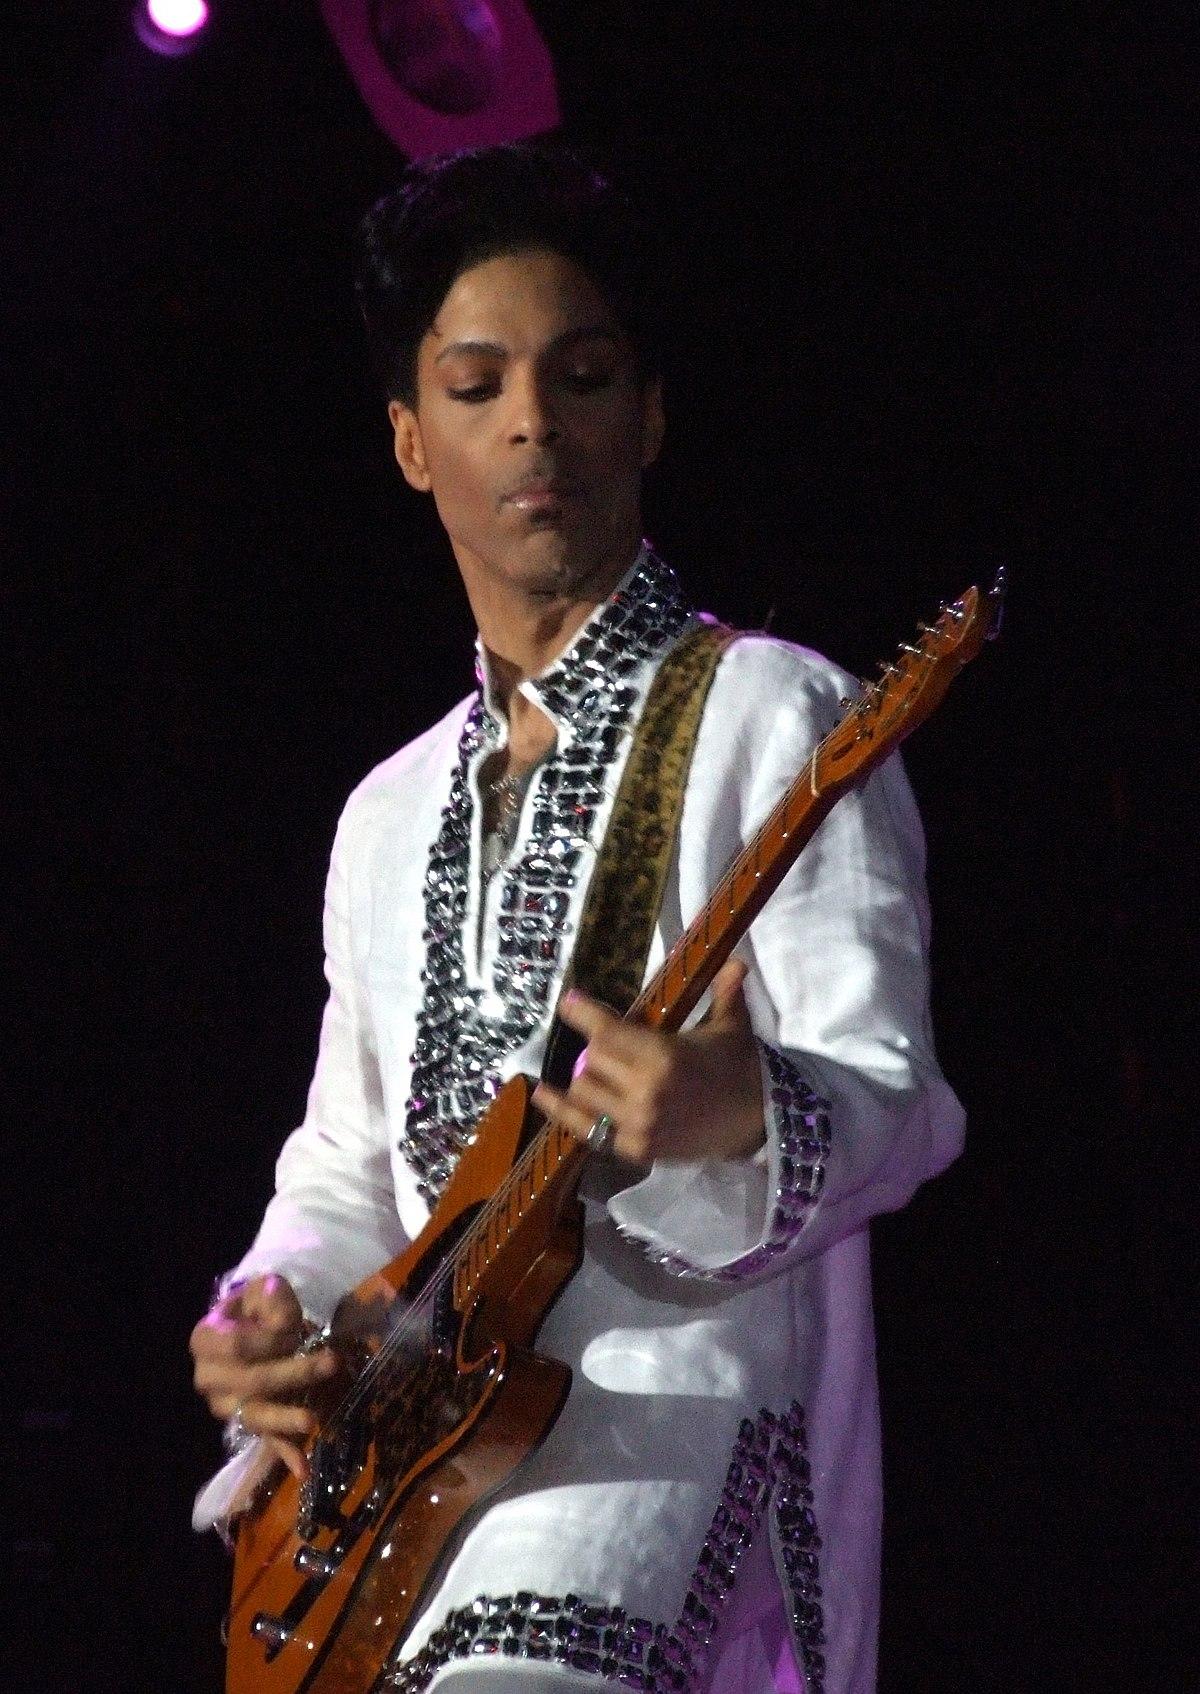 Prince Artist Wikipedia